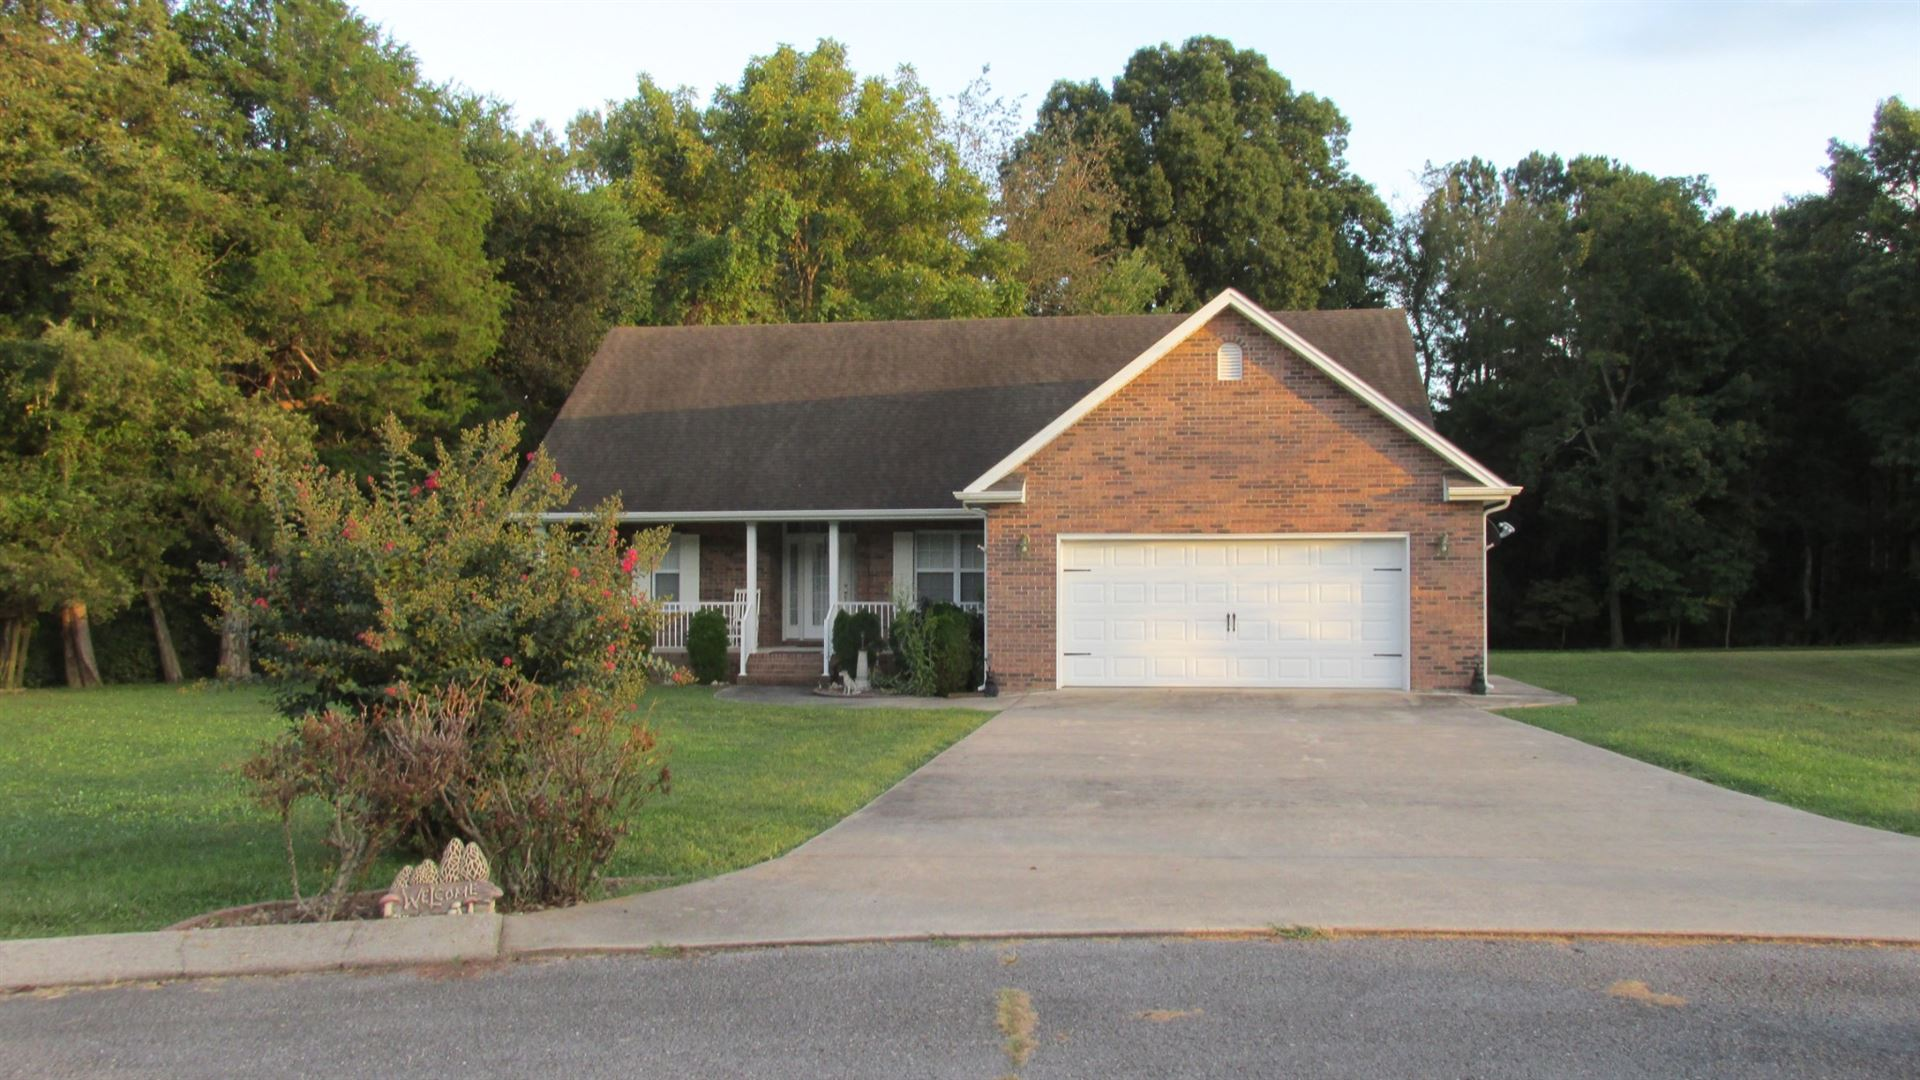 96 Rebecca Ln E, Estill Springs, TN 37330 - MLS#: 2294805